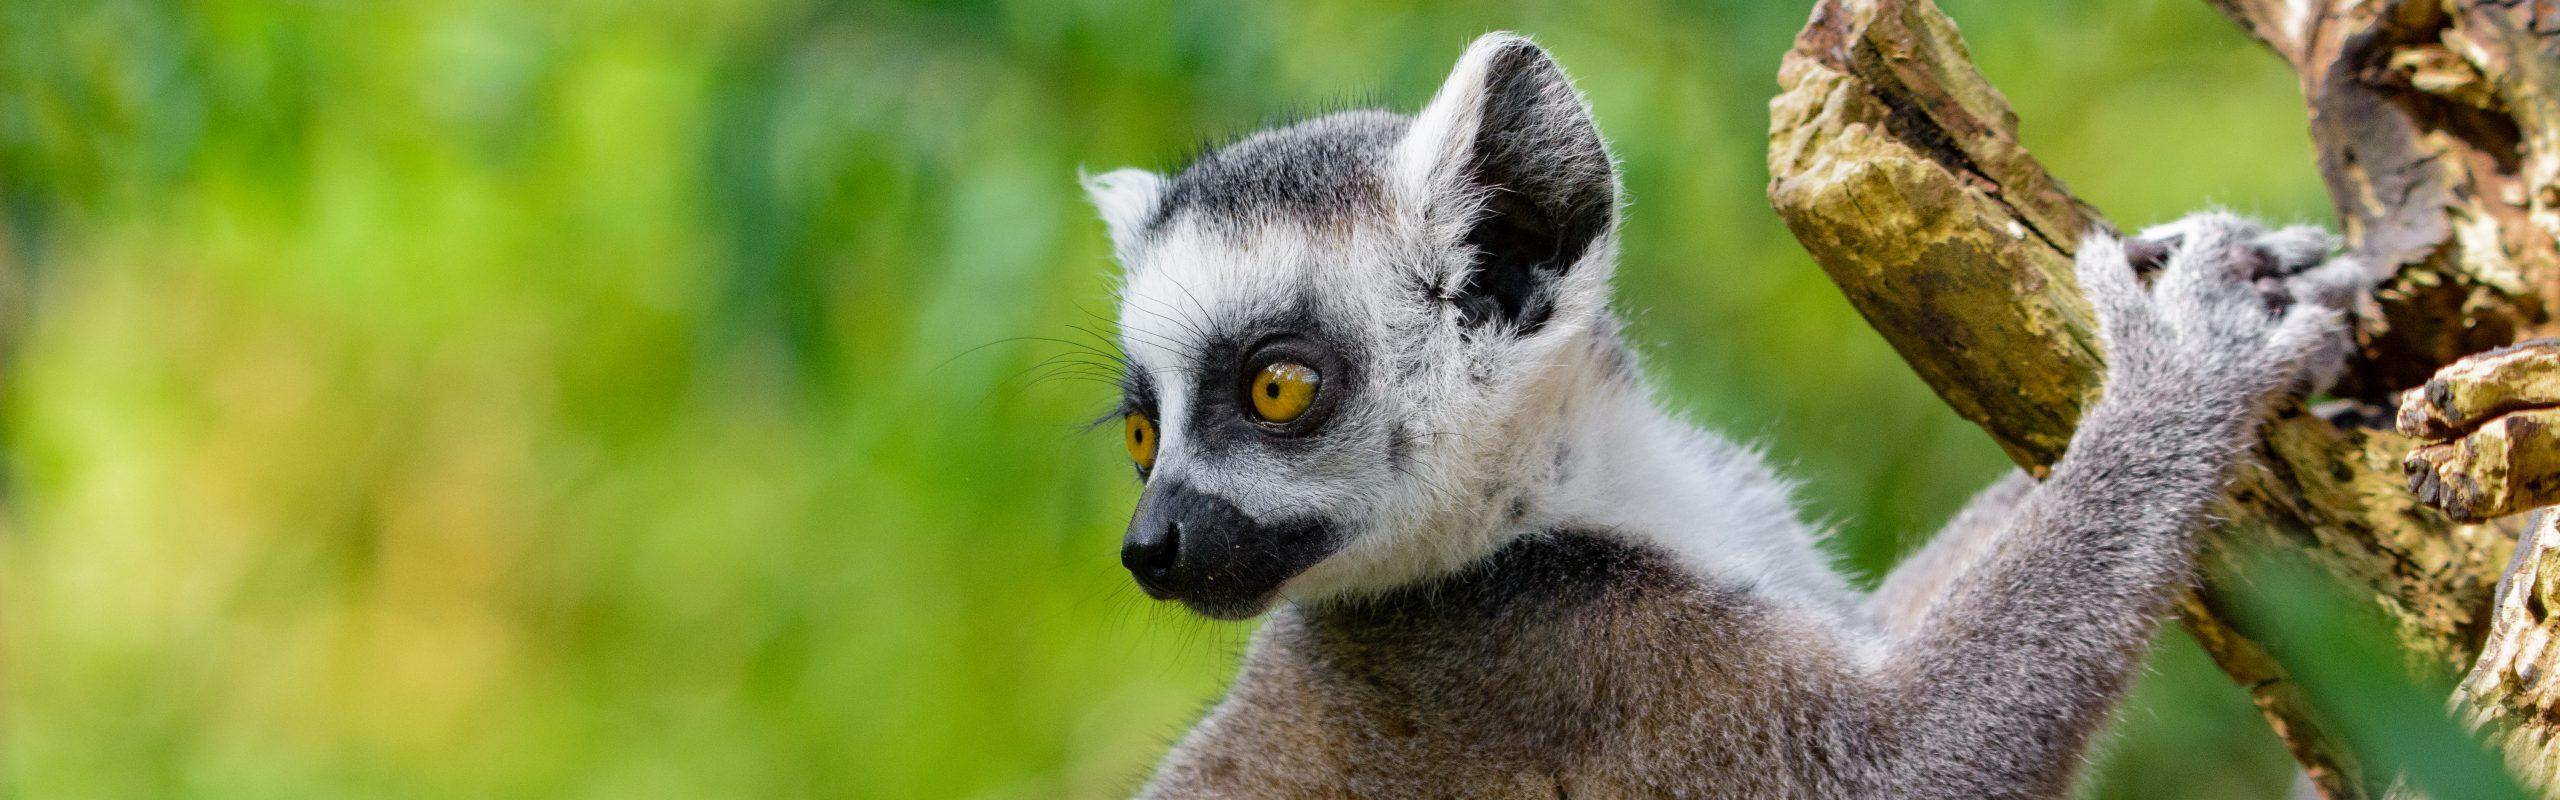 https://faunafocus.com/home/november-2018-ring-tailed-lemur/#jp-carousel-11936